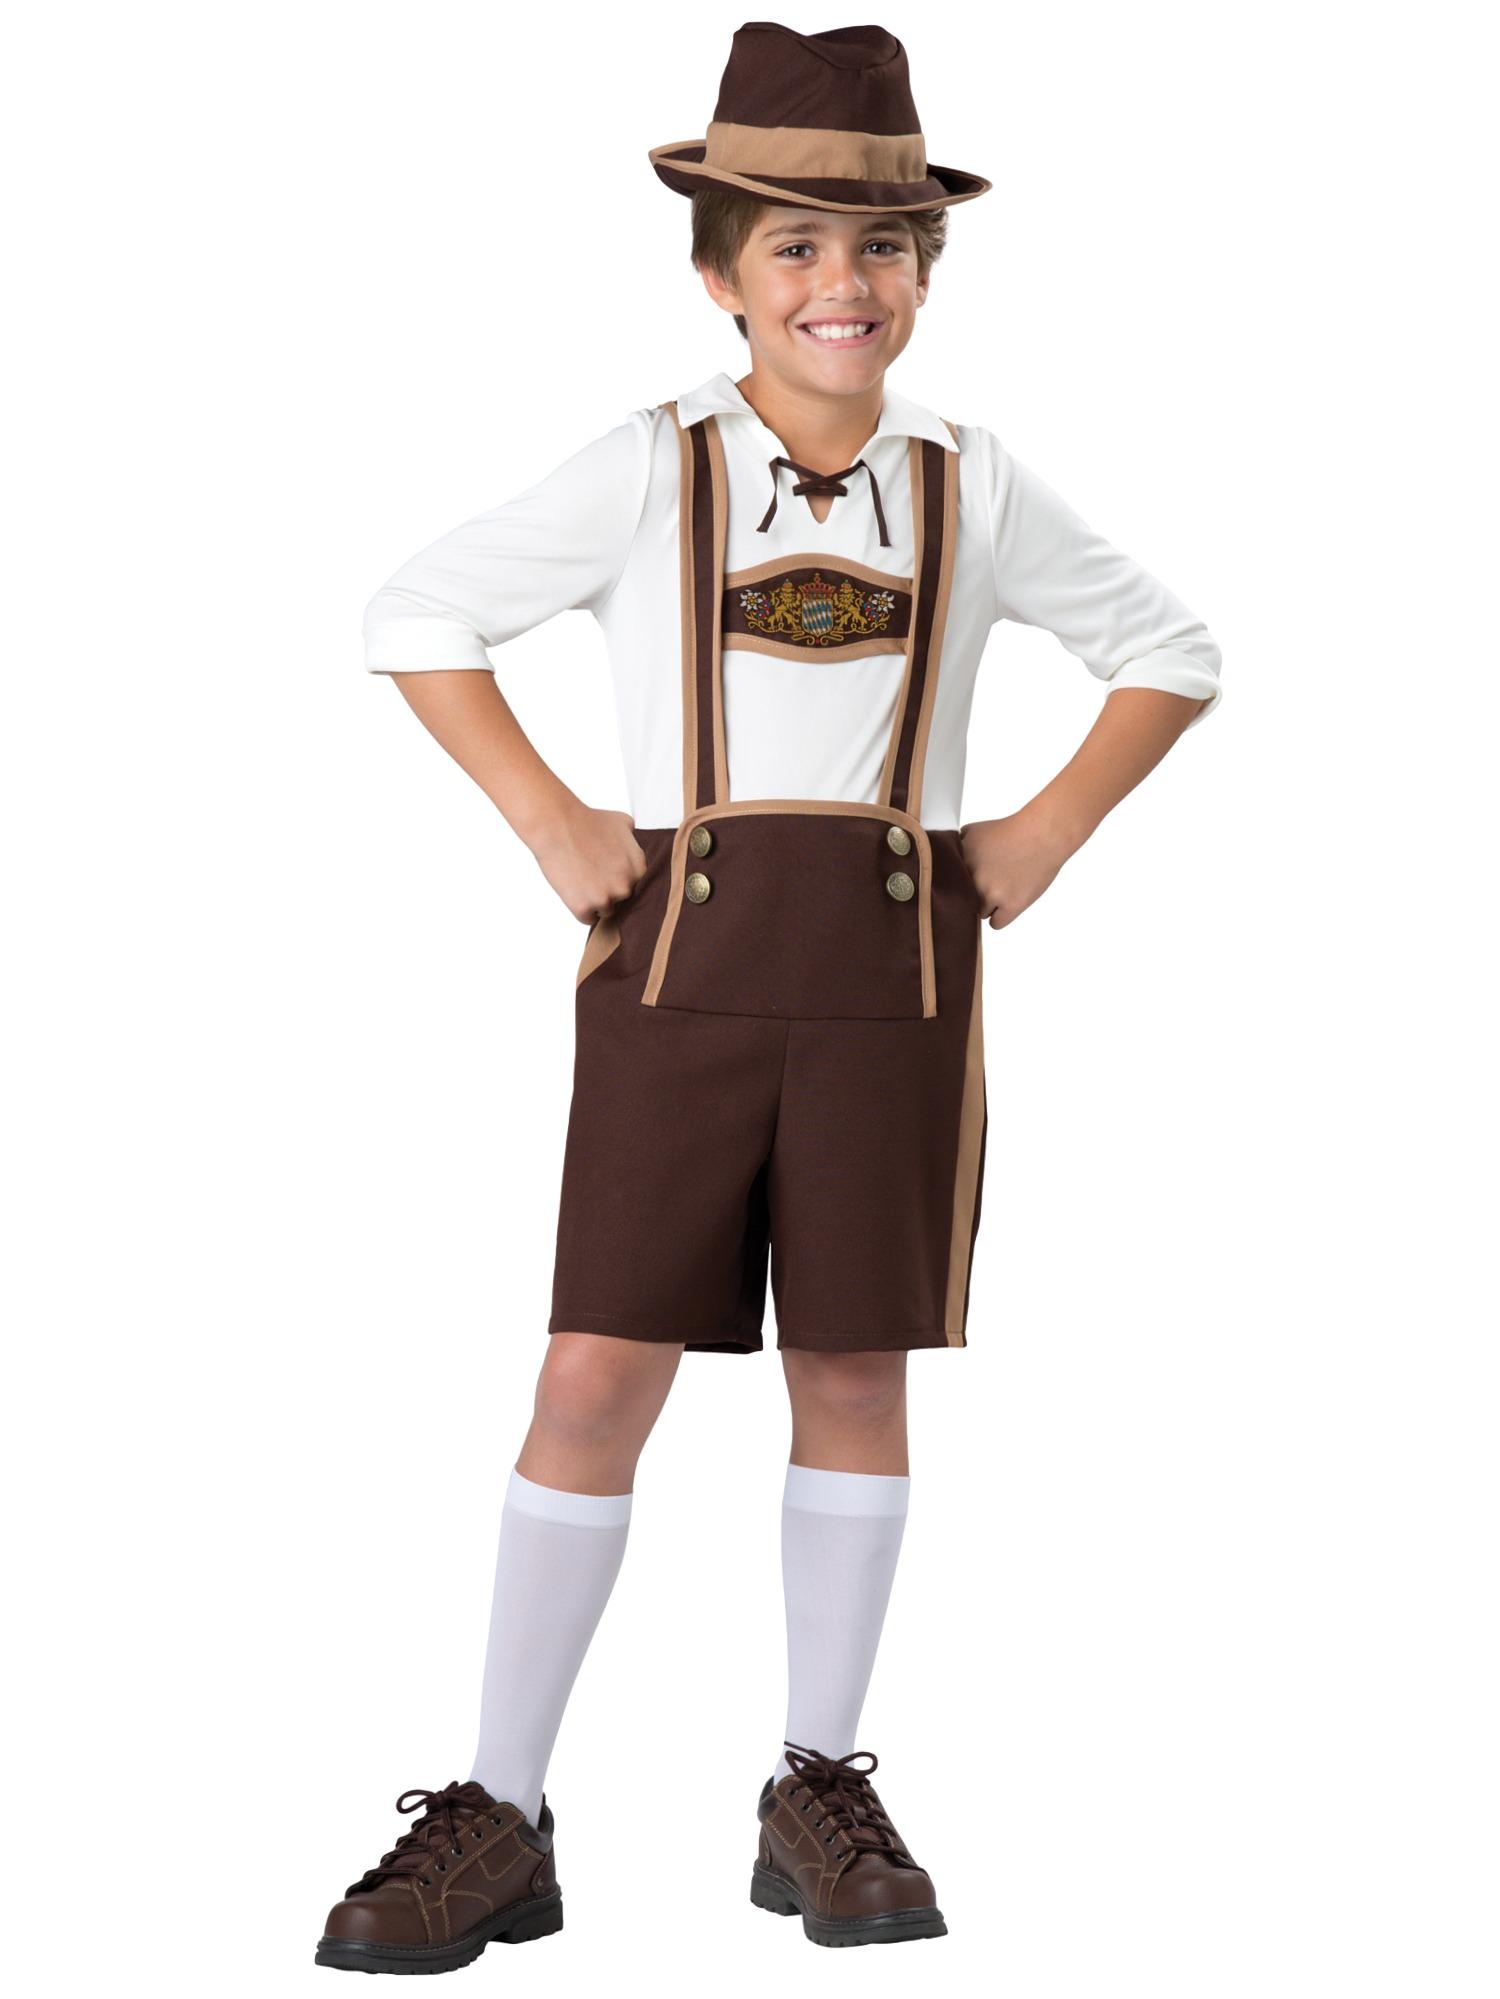 d3889de739d Details about Bavarian Guy Oktoberfest Lederhosen German Fancy Dress Up  Boys Costume